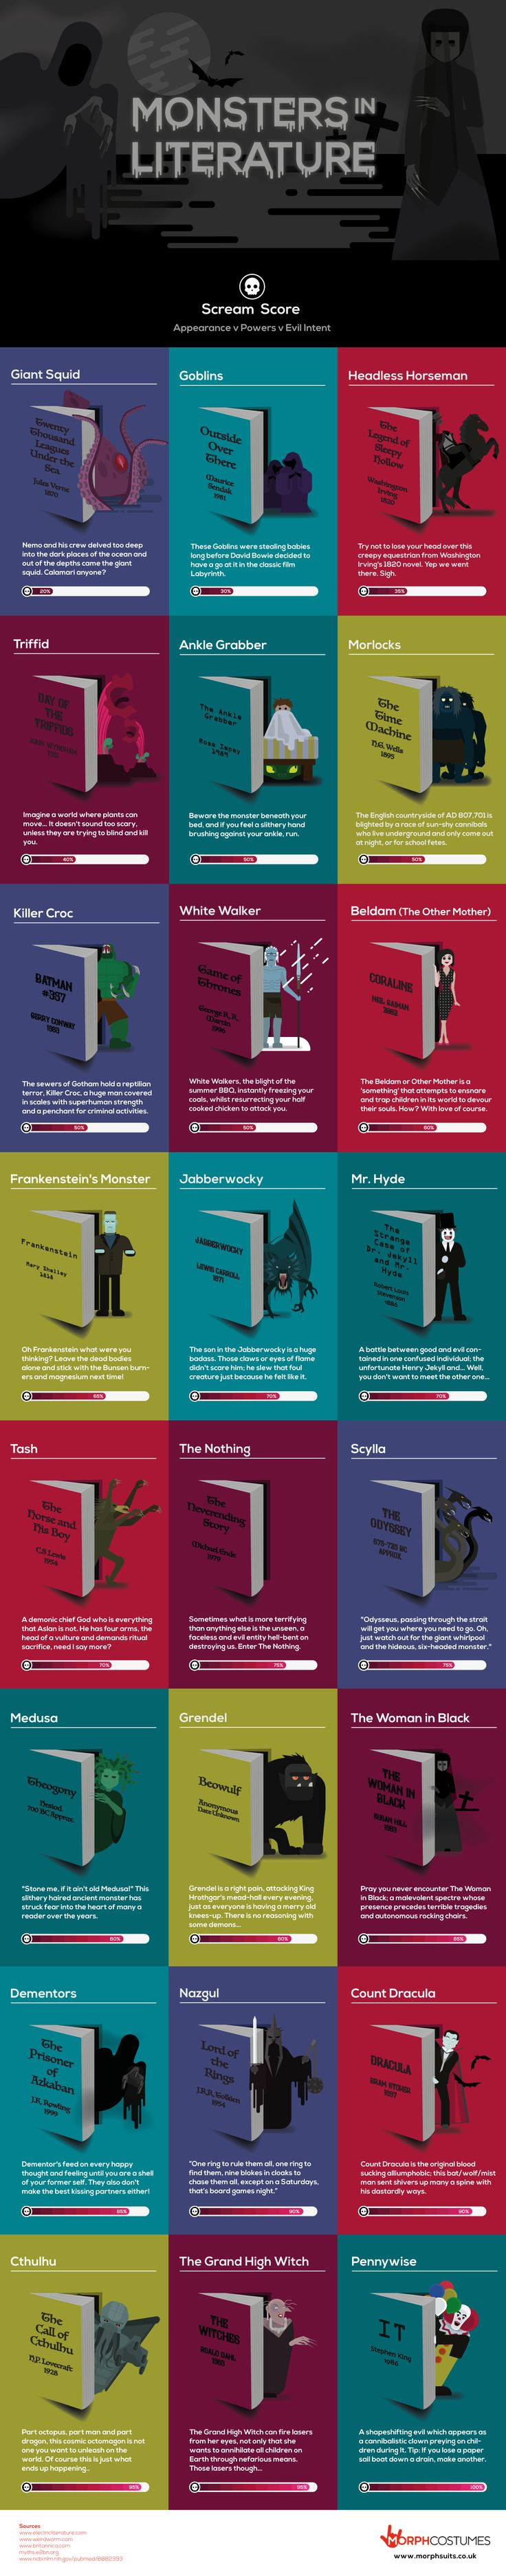 Ranking literary monsters